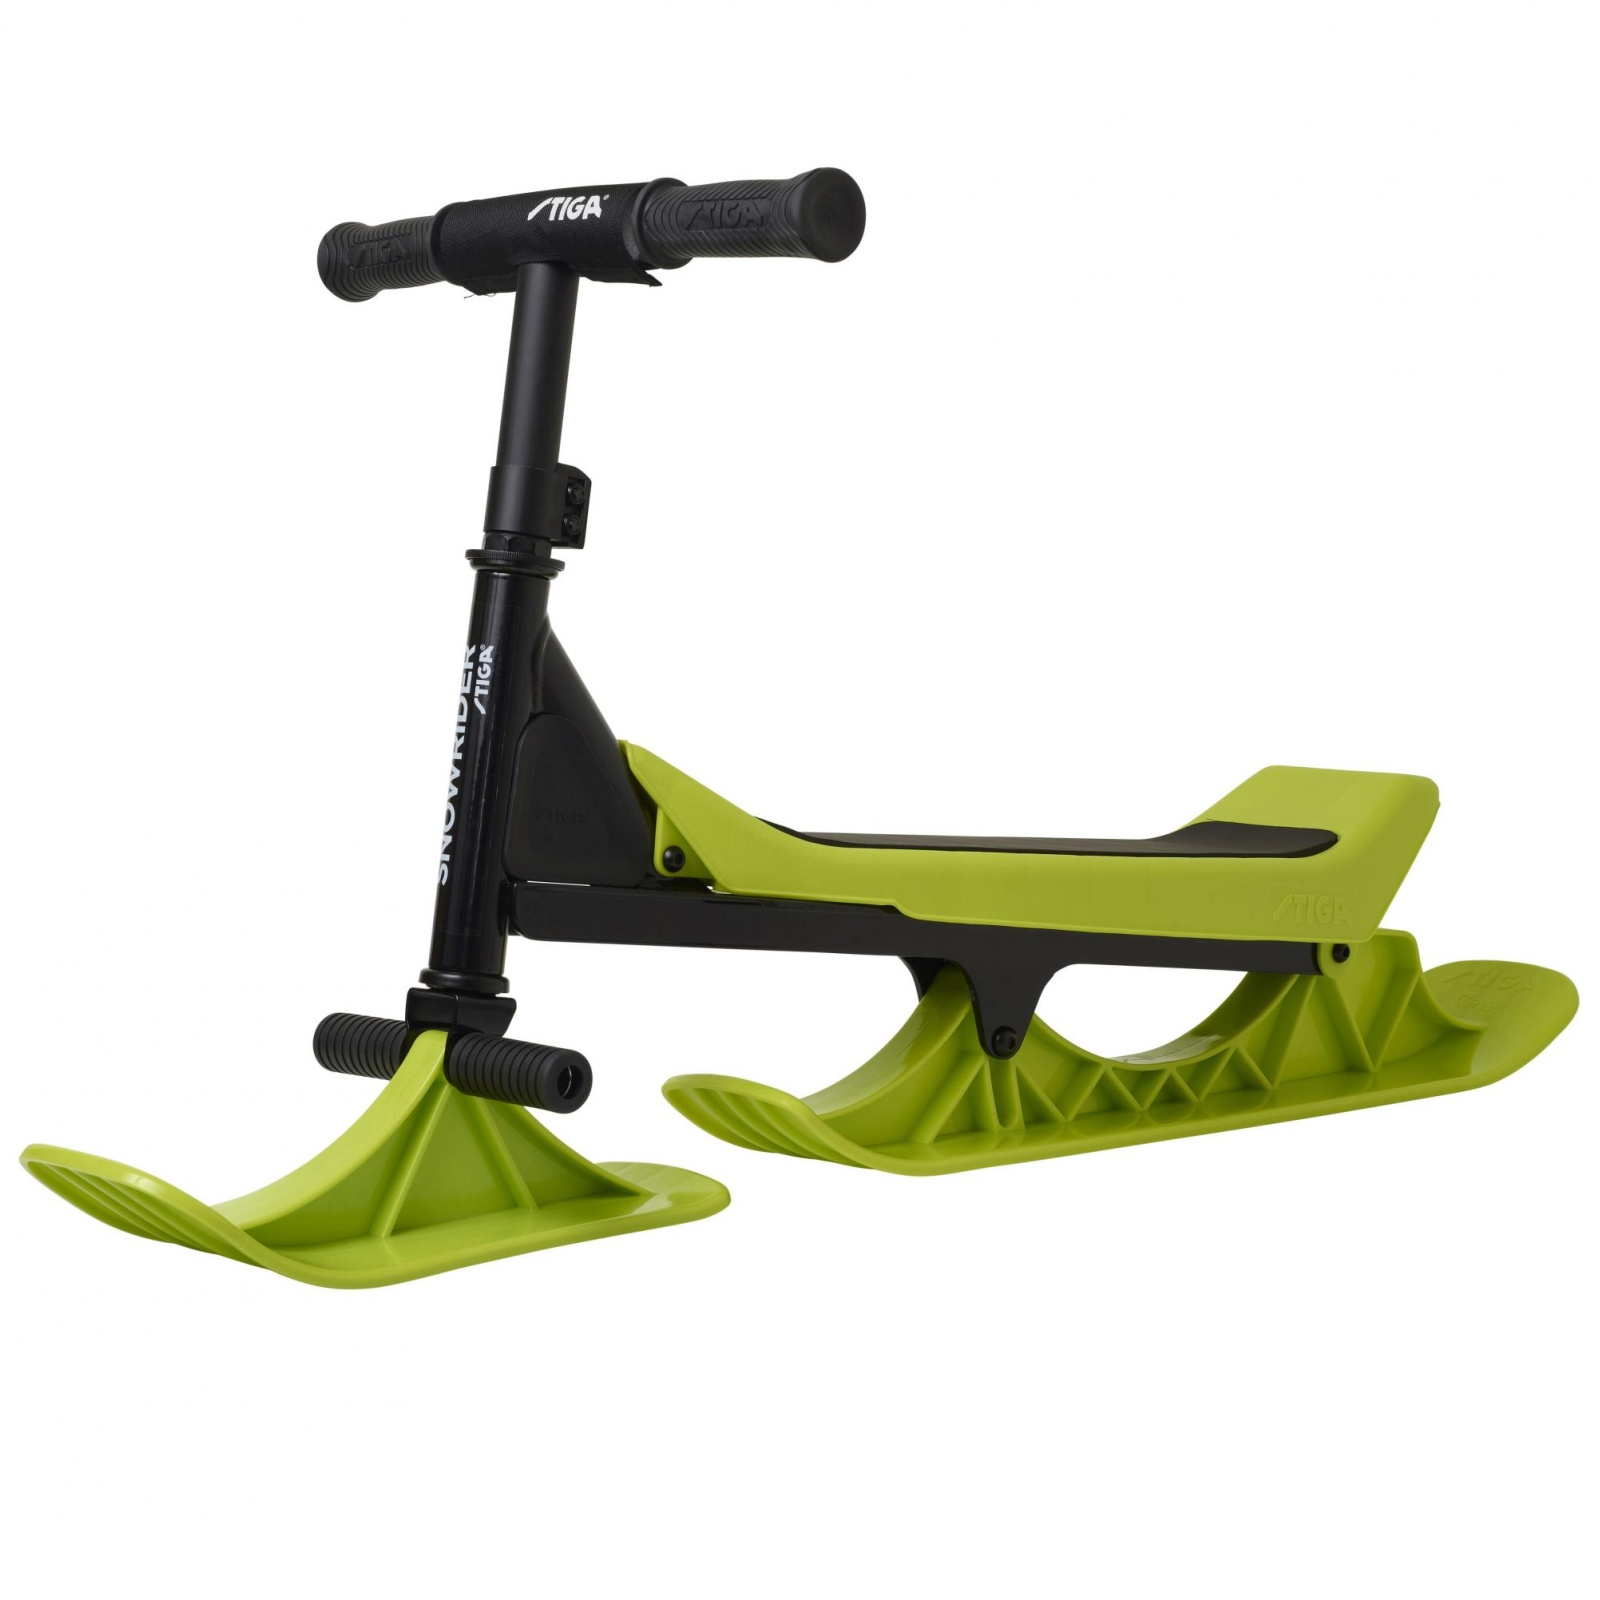 Sněžná koloběžka STIGA Snow Rider - černo-zelená